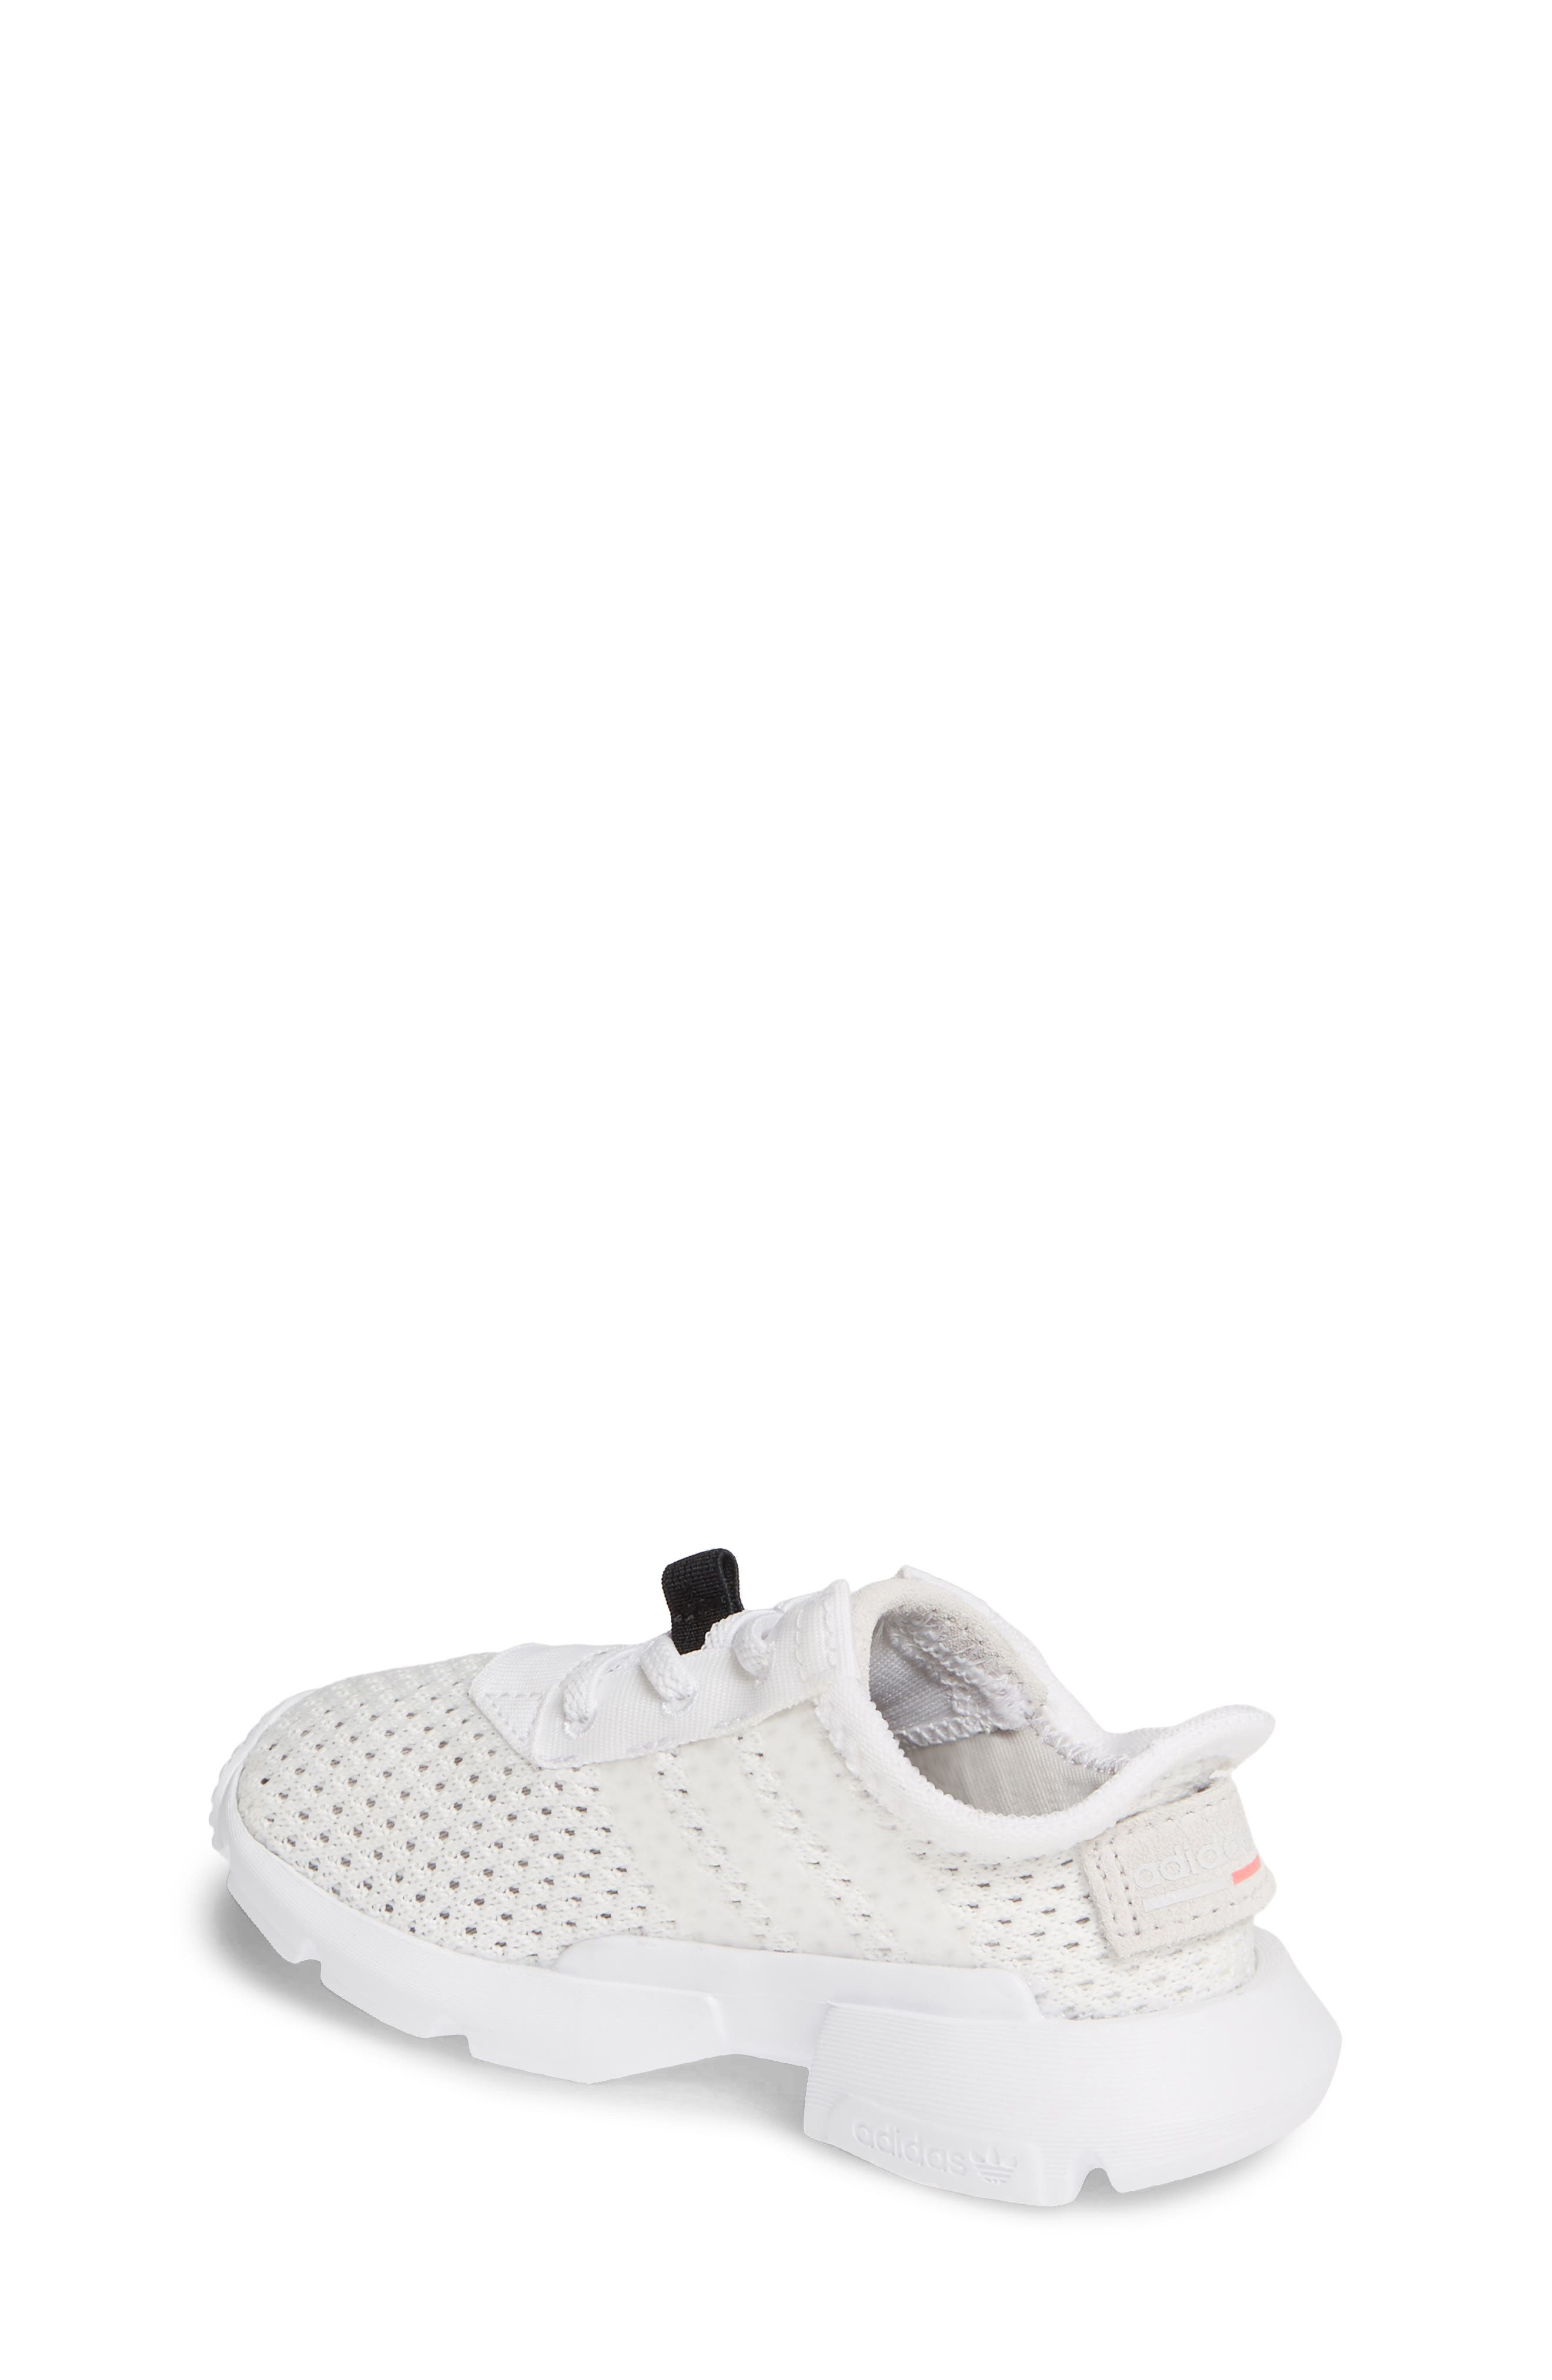 ADIDAS, POD-S3.1 Sneaker, Alternate thumbnail 2, color, WHITE/ WHITE/ SHOCK RED